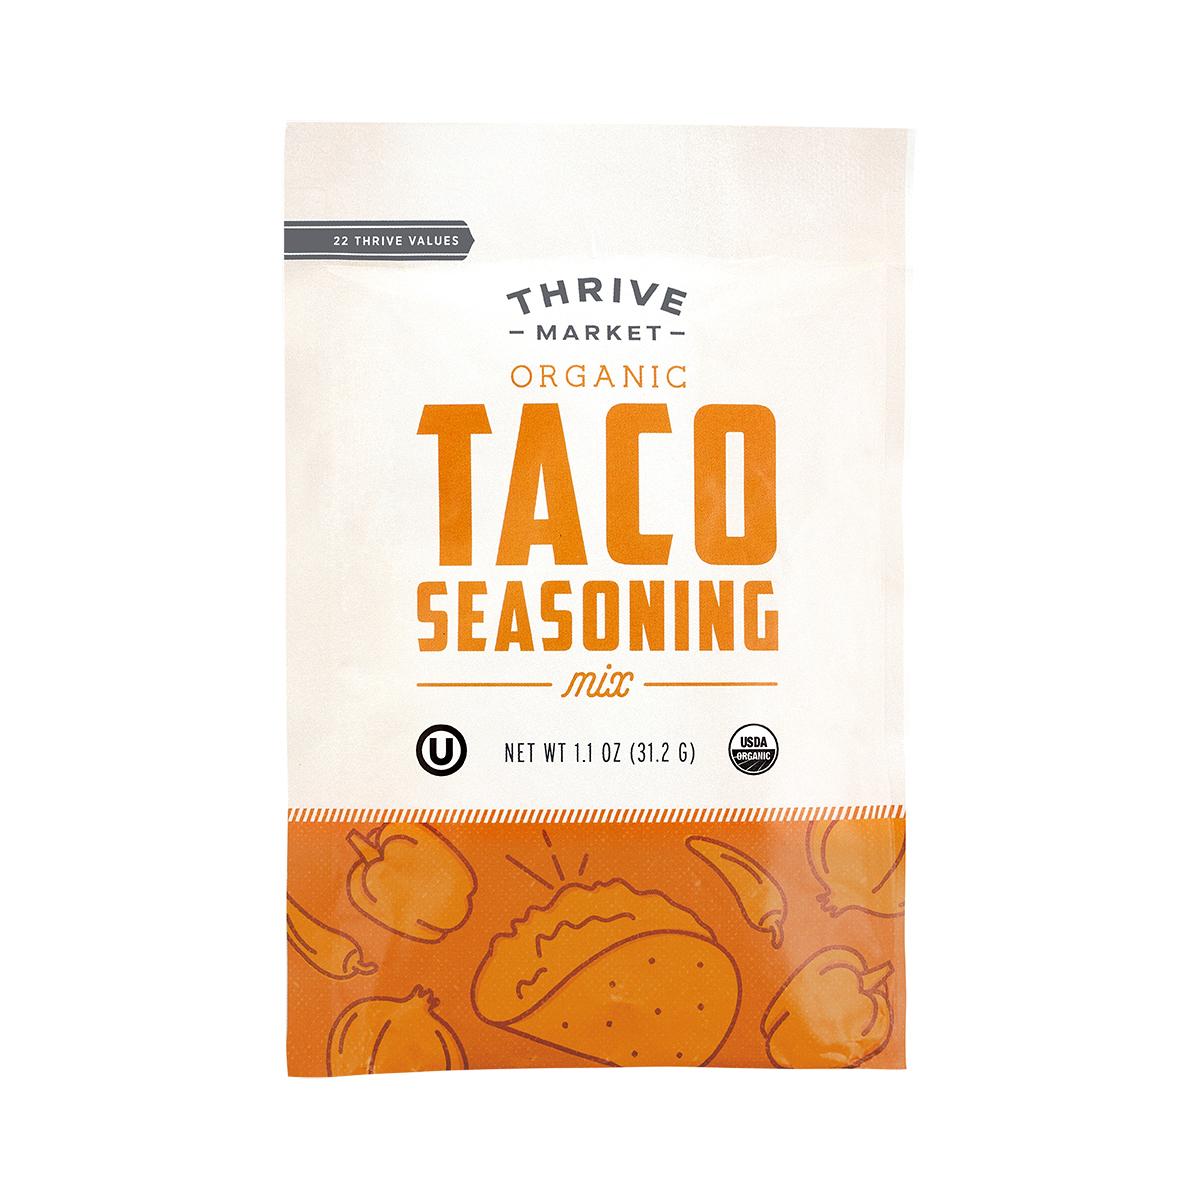 Thrive Market Organic Taco Seasoning 1.1 oz pouch